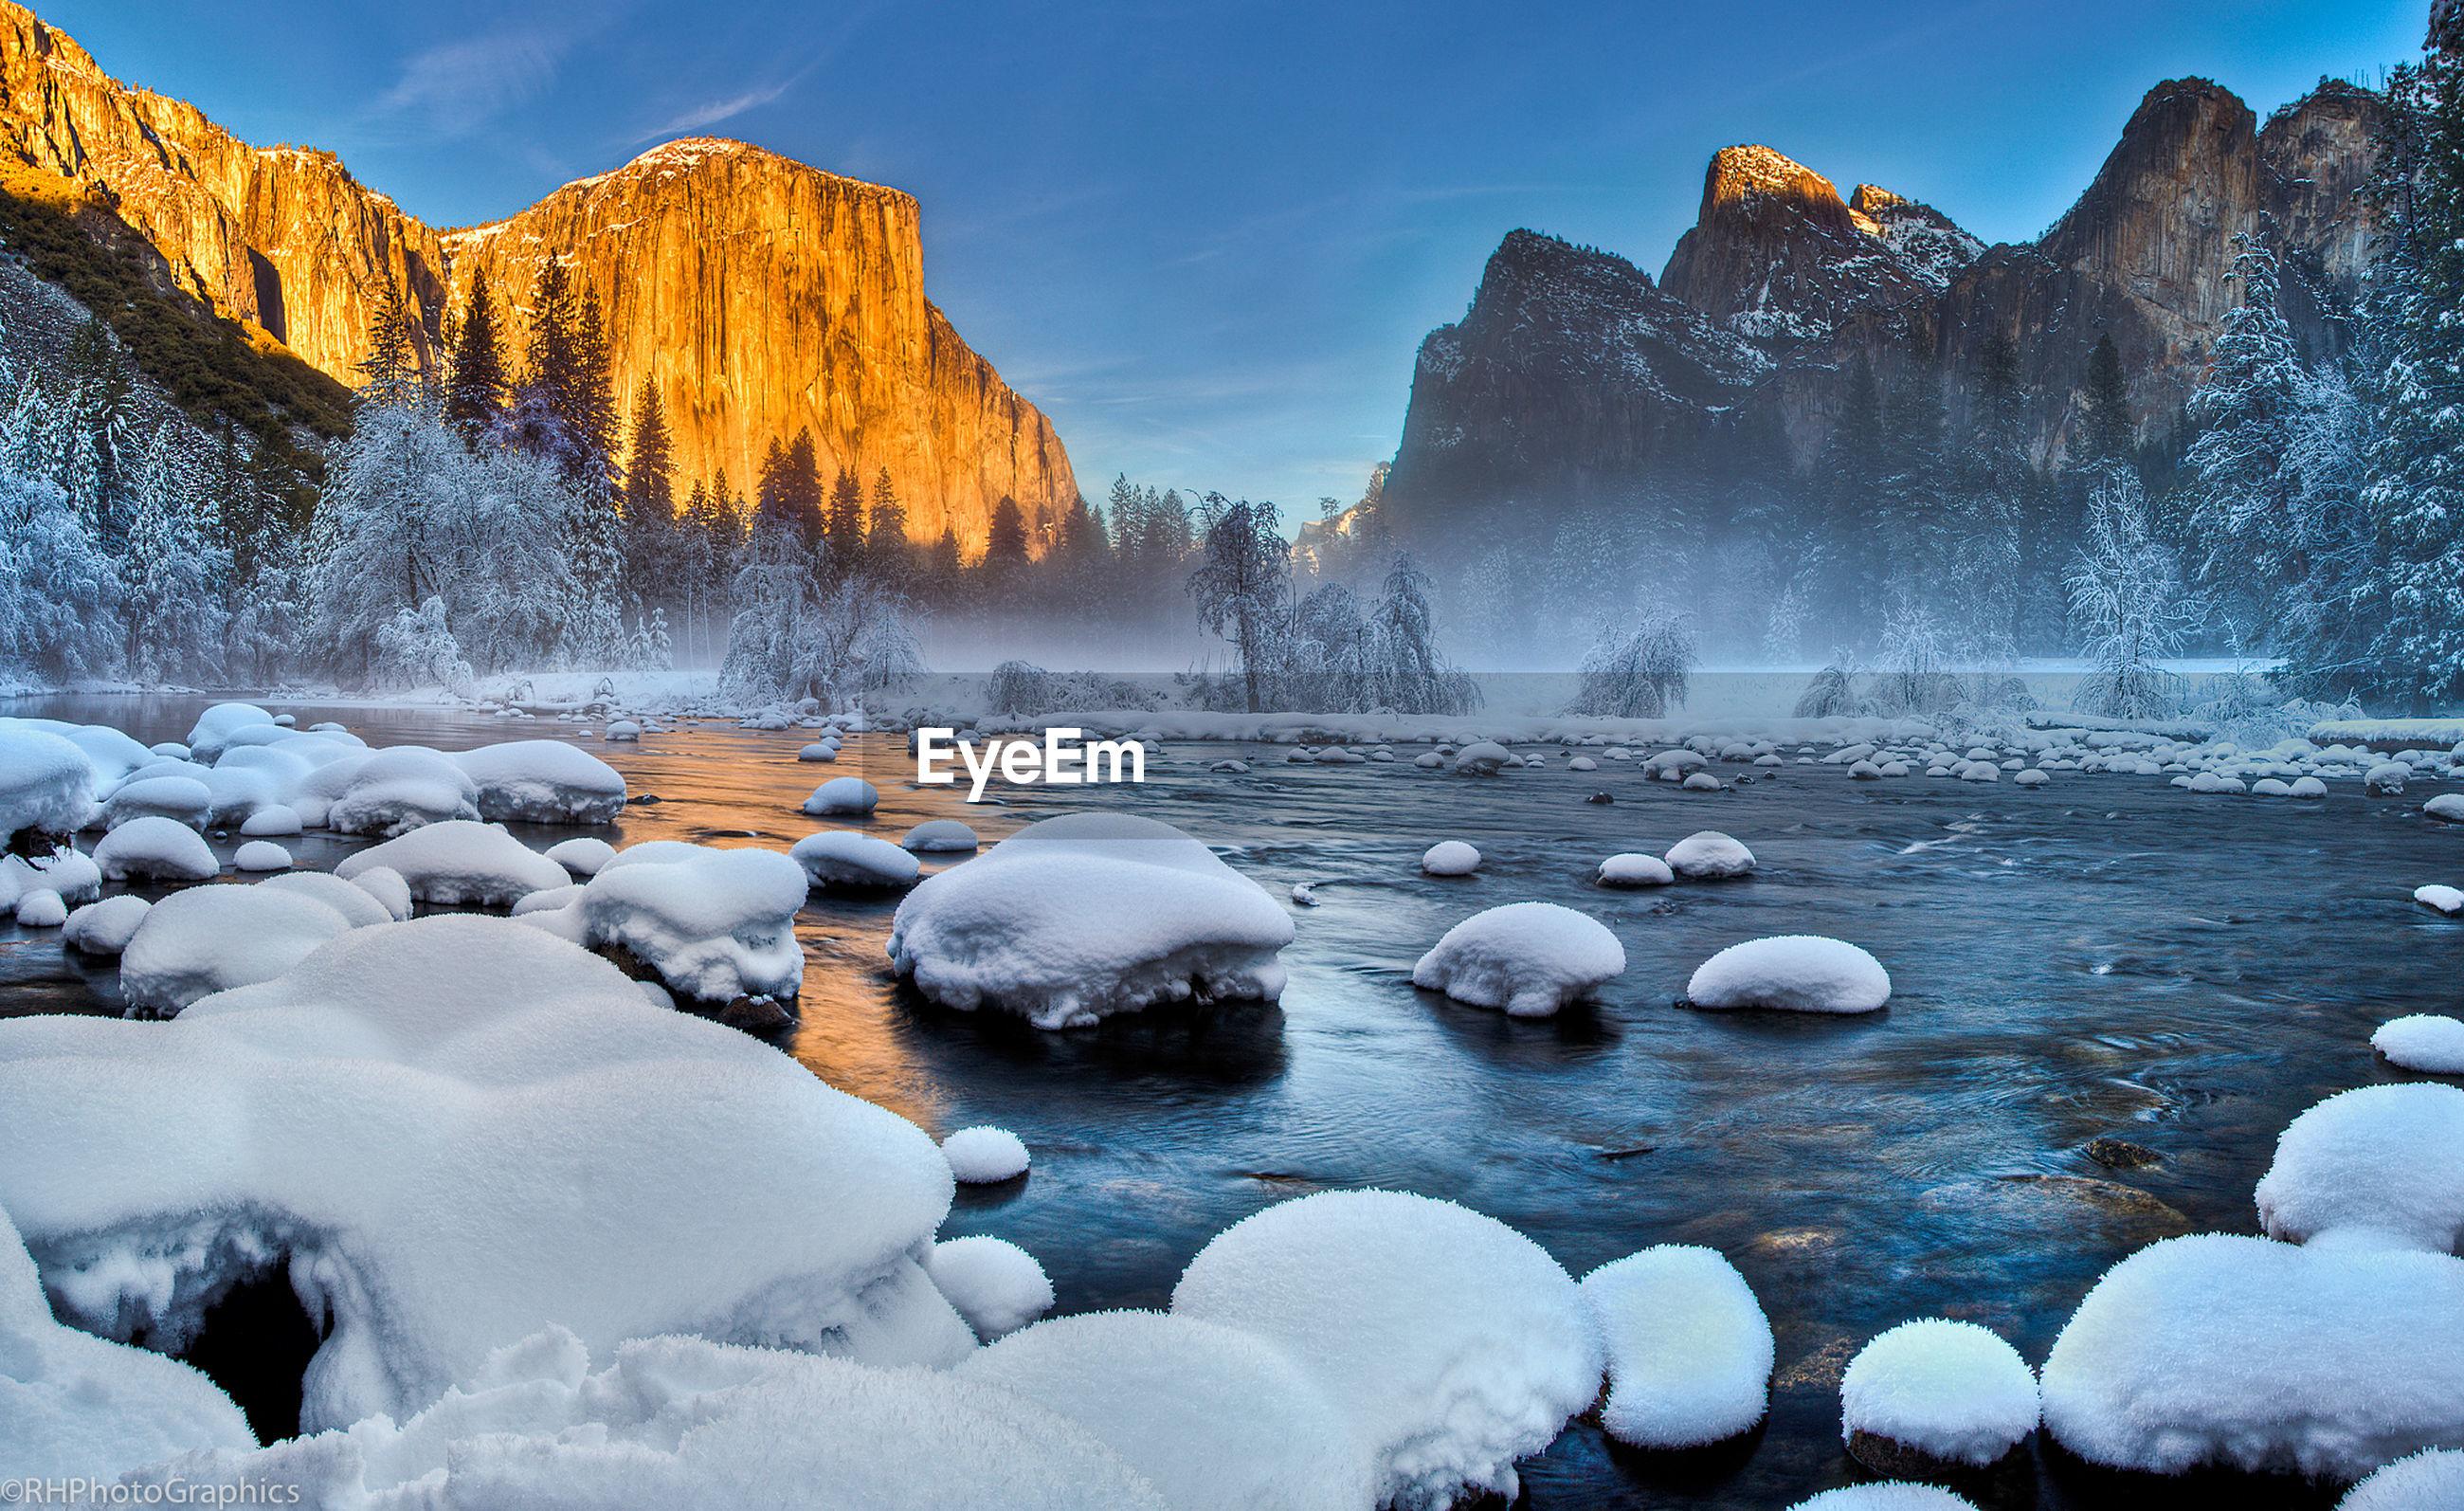 Calm lake against rocky mountain range during winter